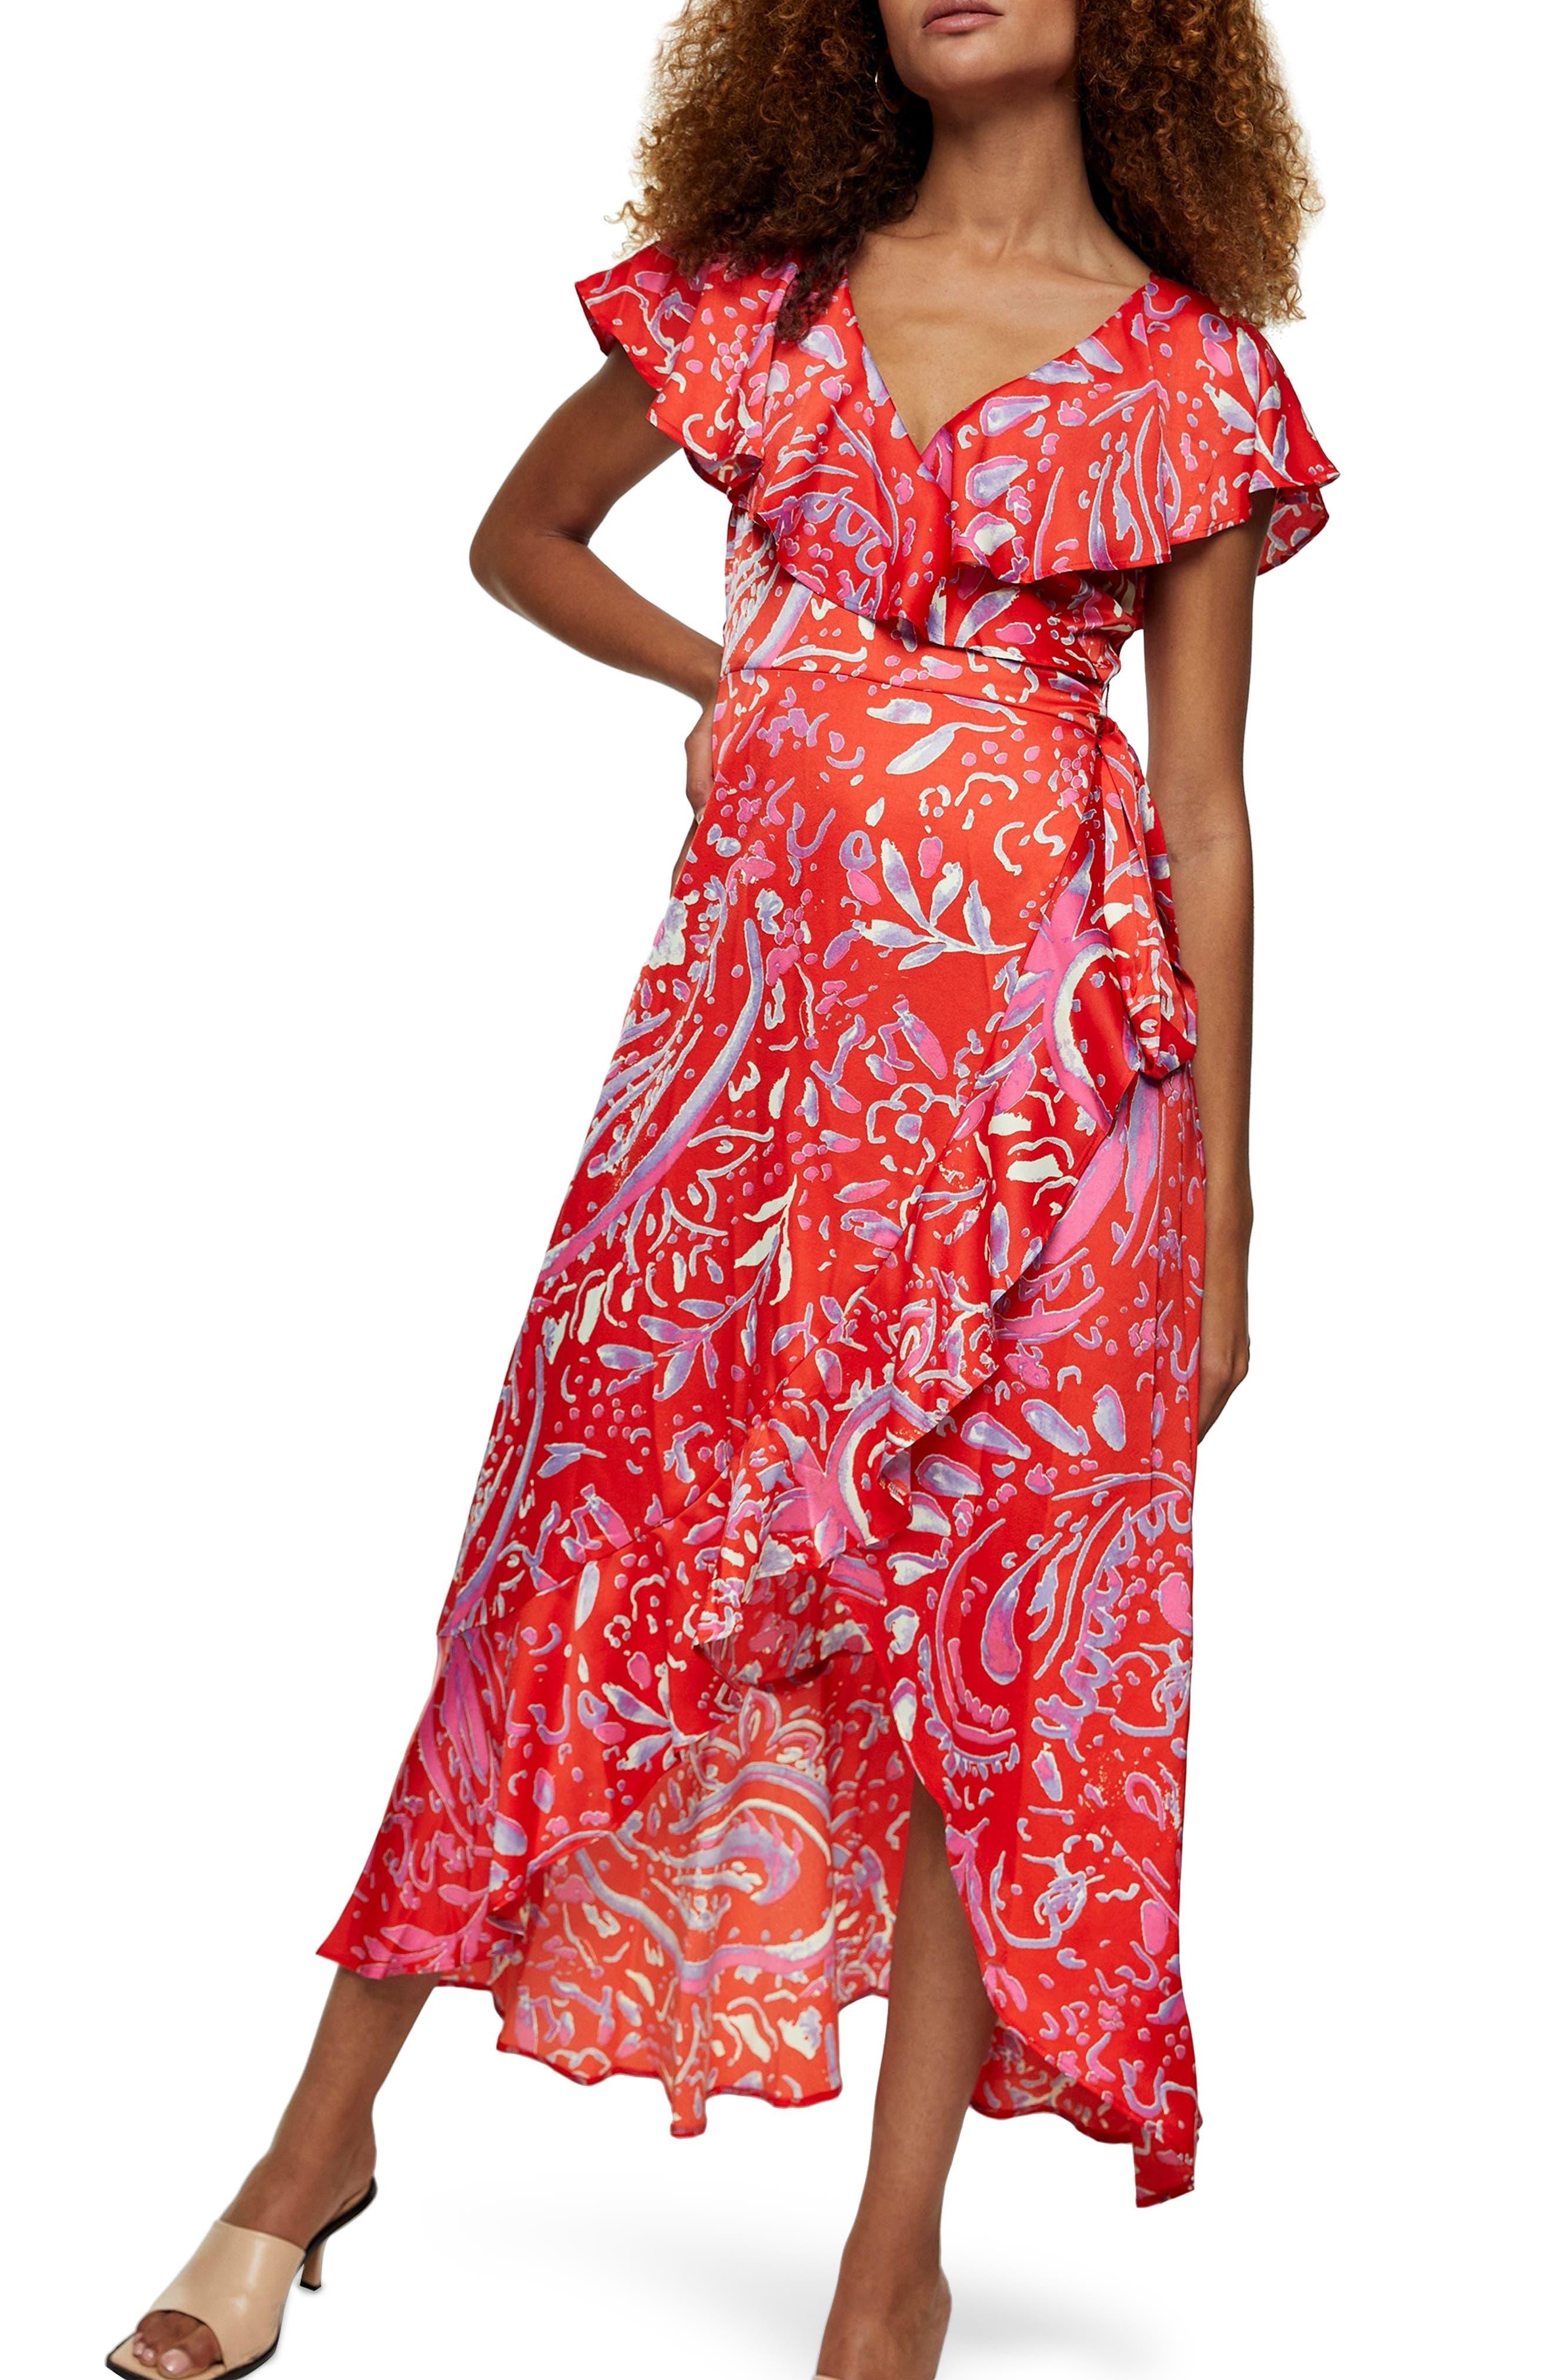 Topshop Satin Ruffle Wrap High/Low Dress | Nordstrom